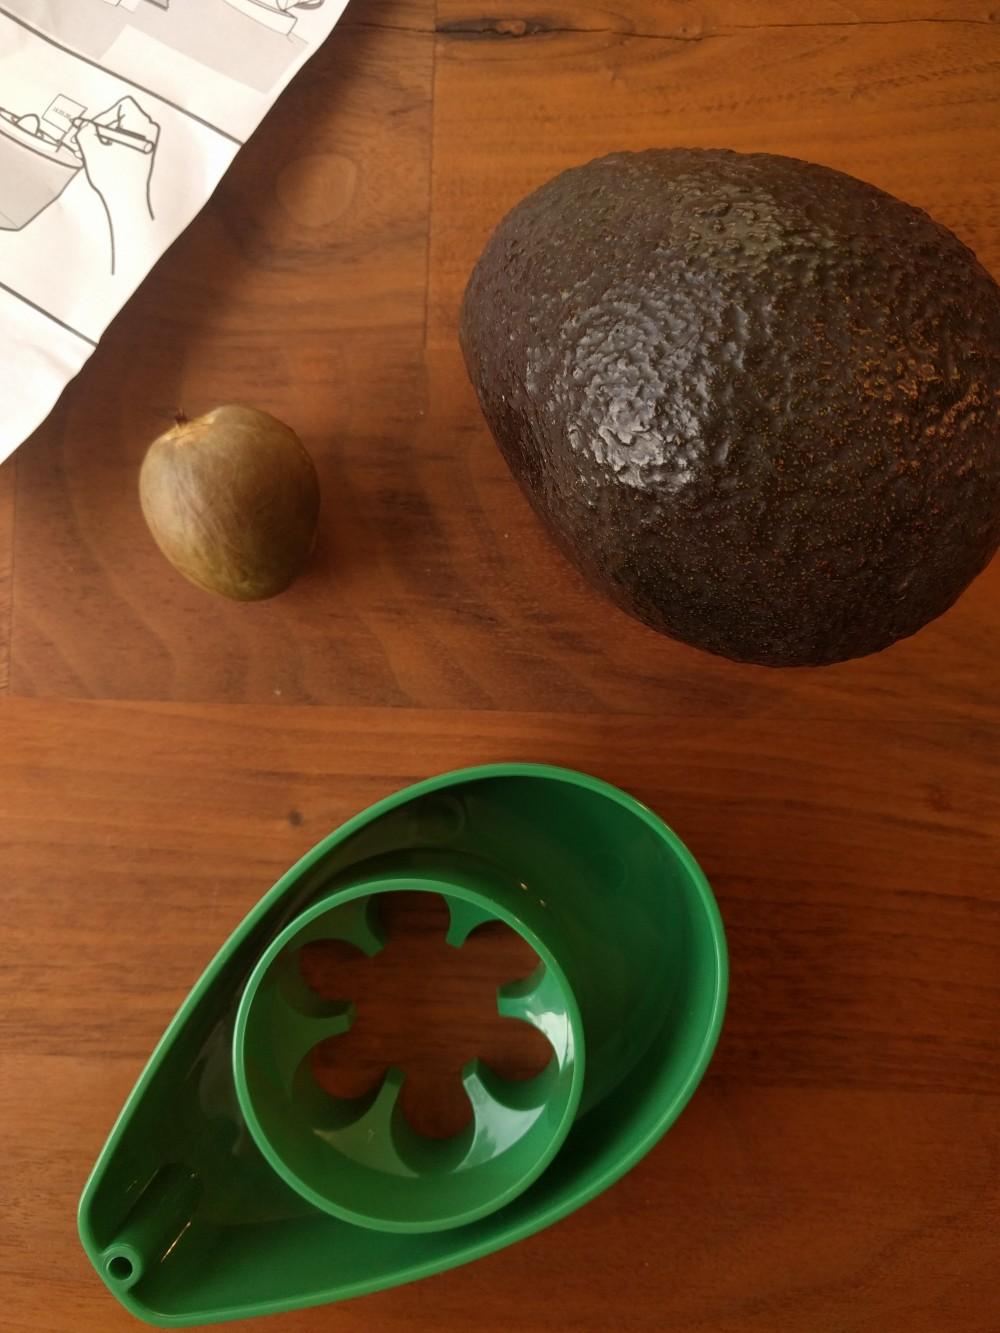 Growing avocados – Using an Avoseedo